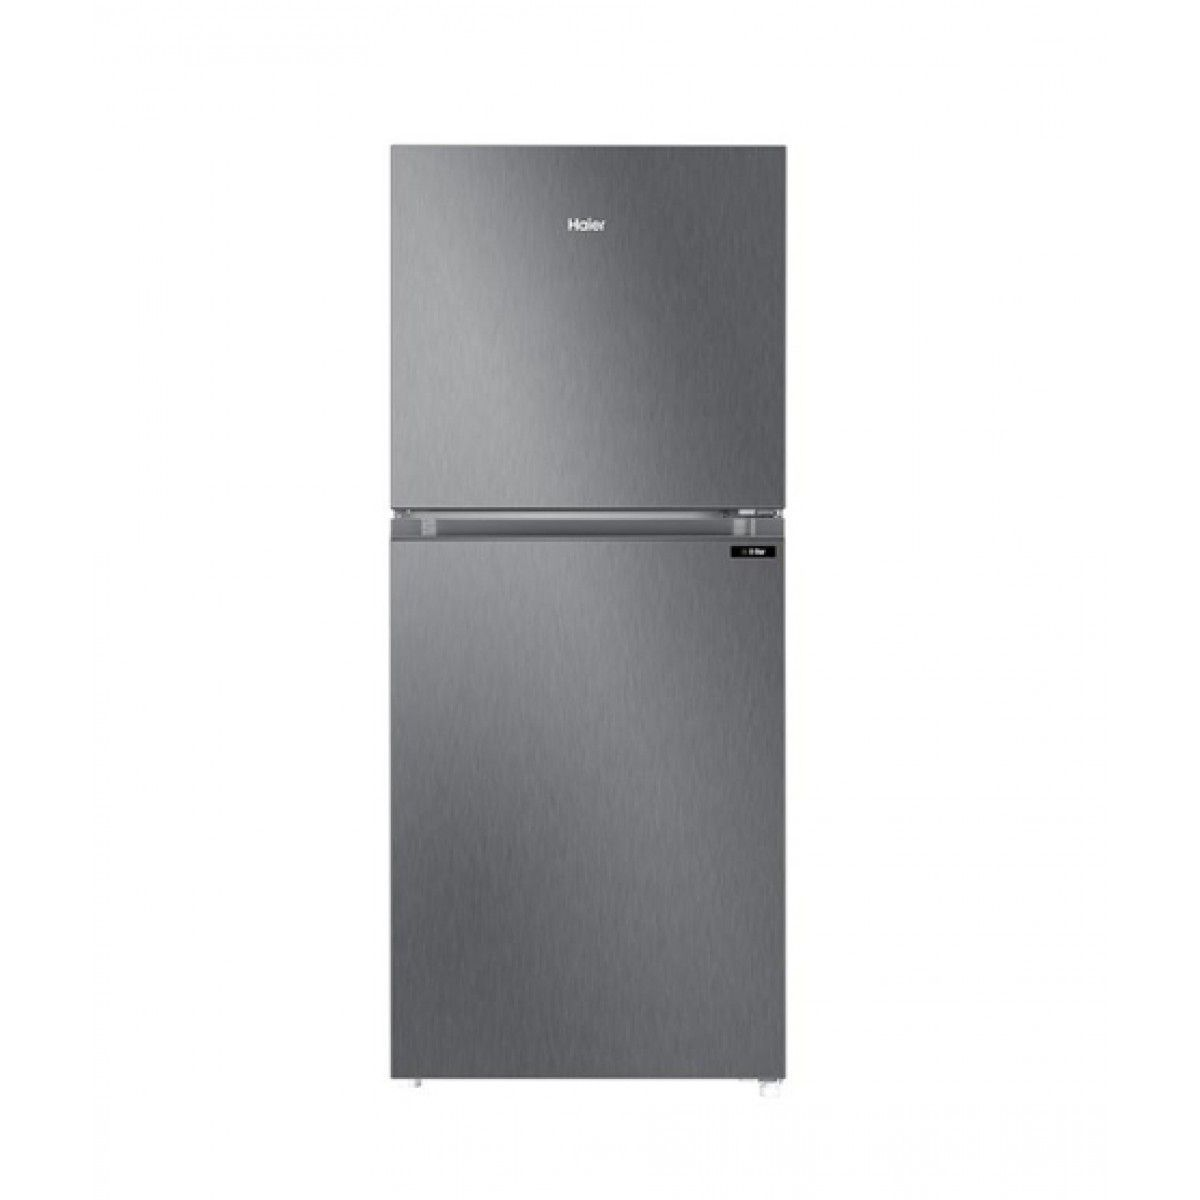 Haier HRF-368EBS 12 Cu Ft Refrigerator